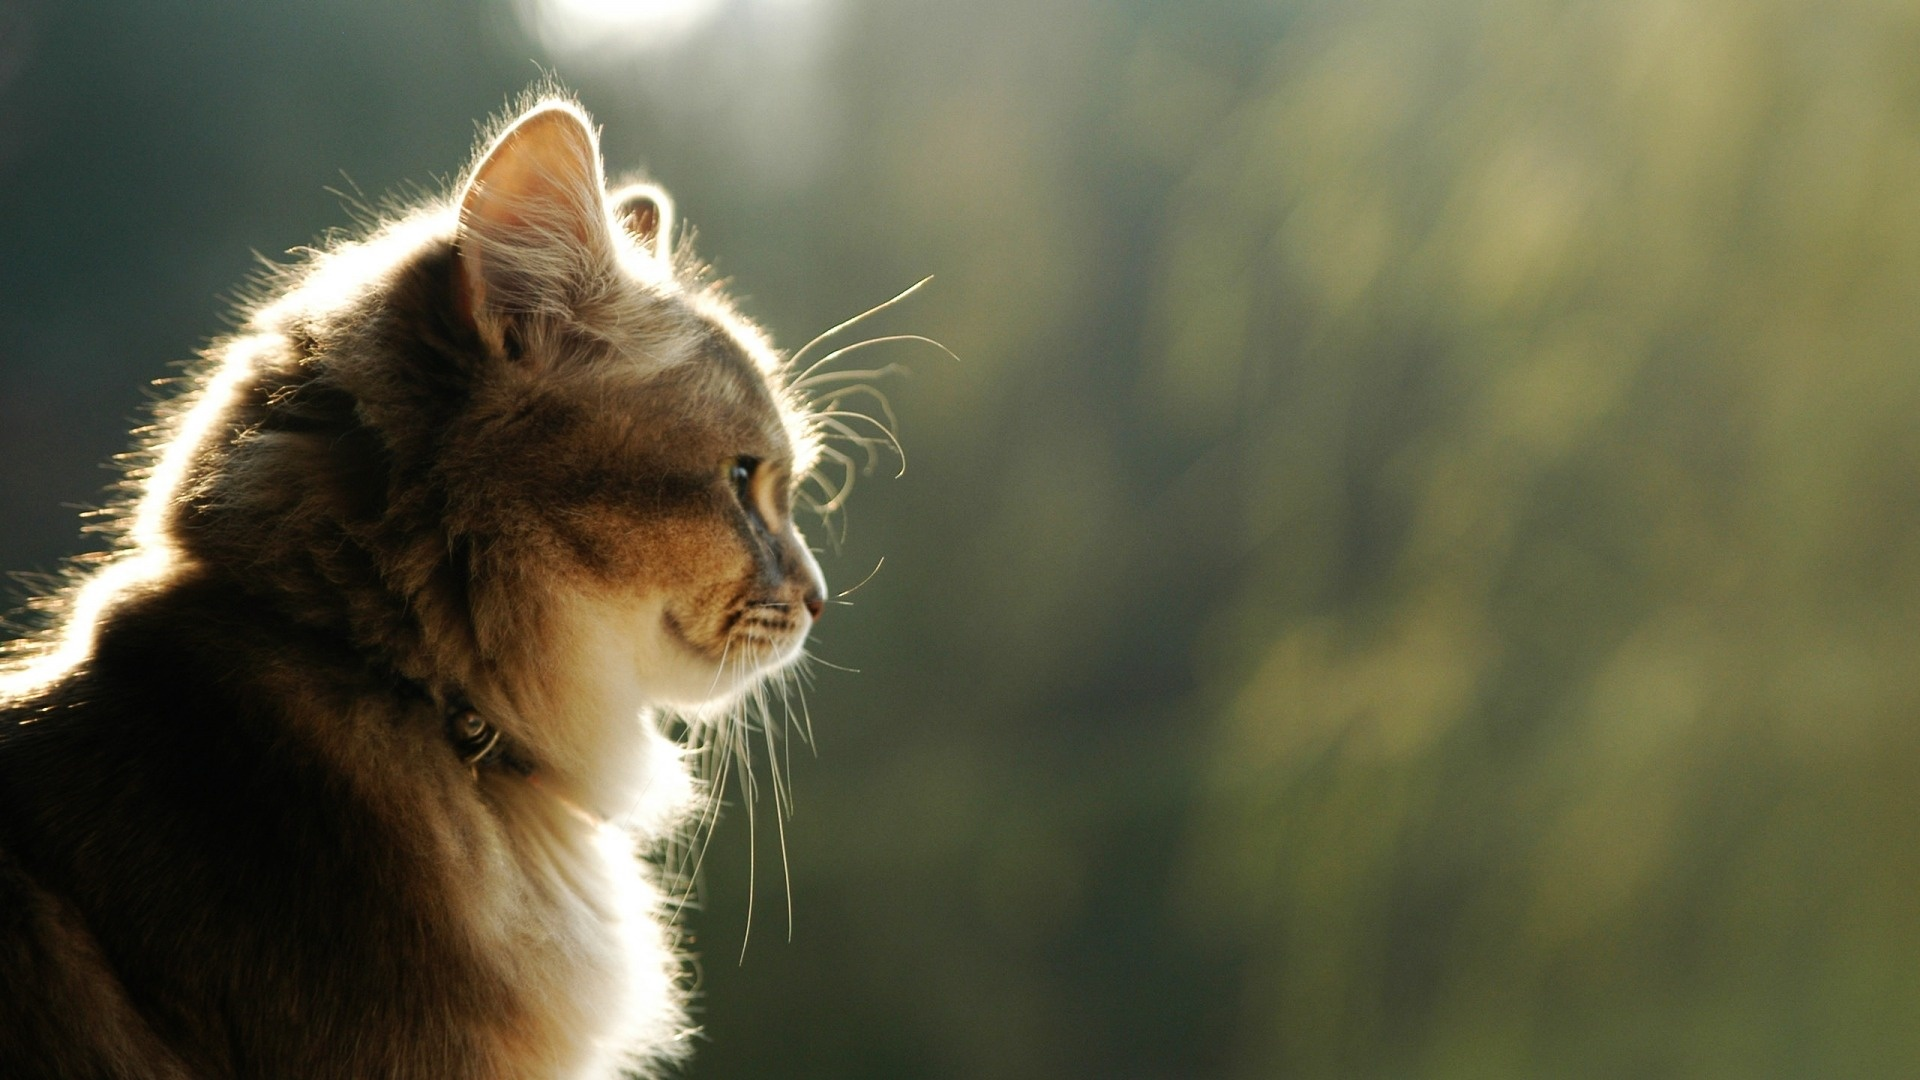 observing desktop cat wallpapers fotos imagem animals 1920x1080